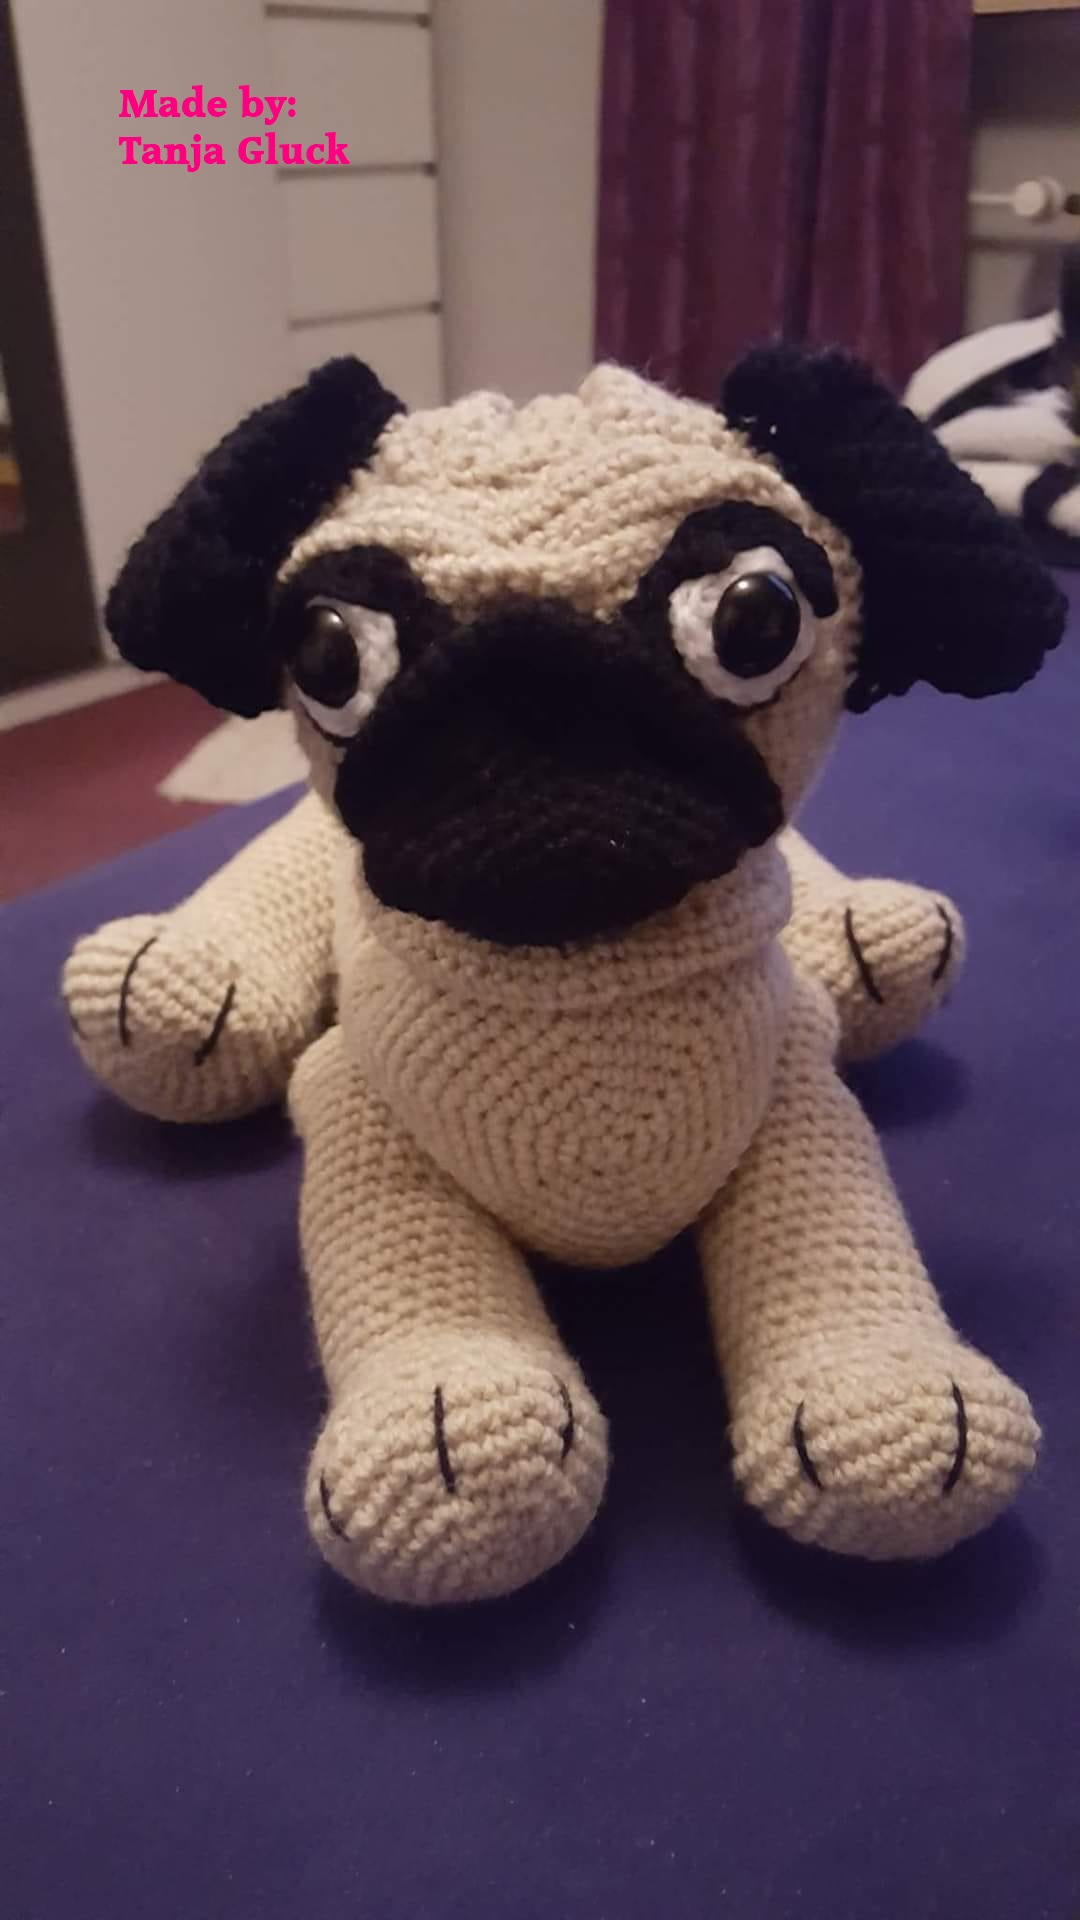 Tanja Gluck Pug Dog